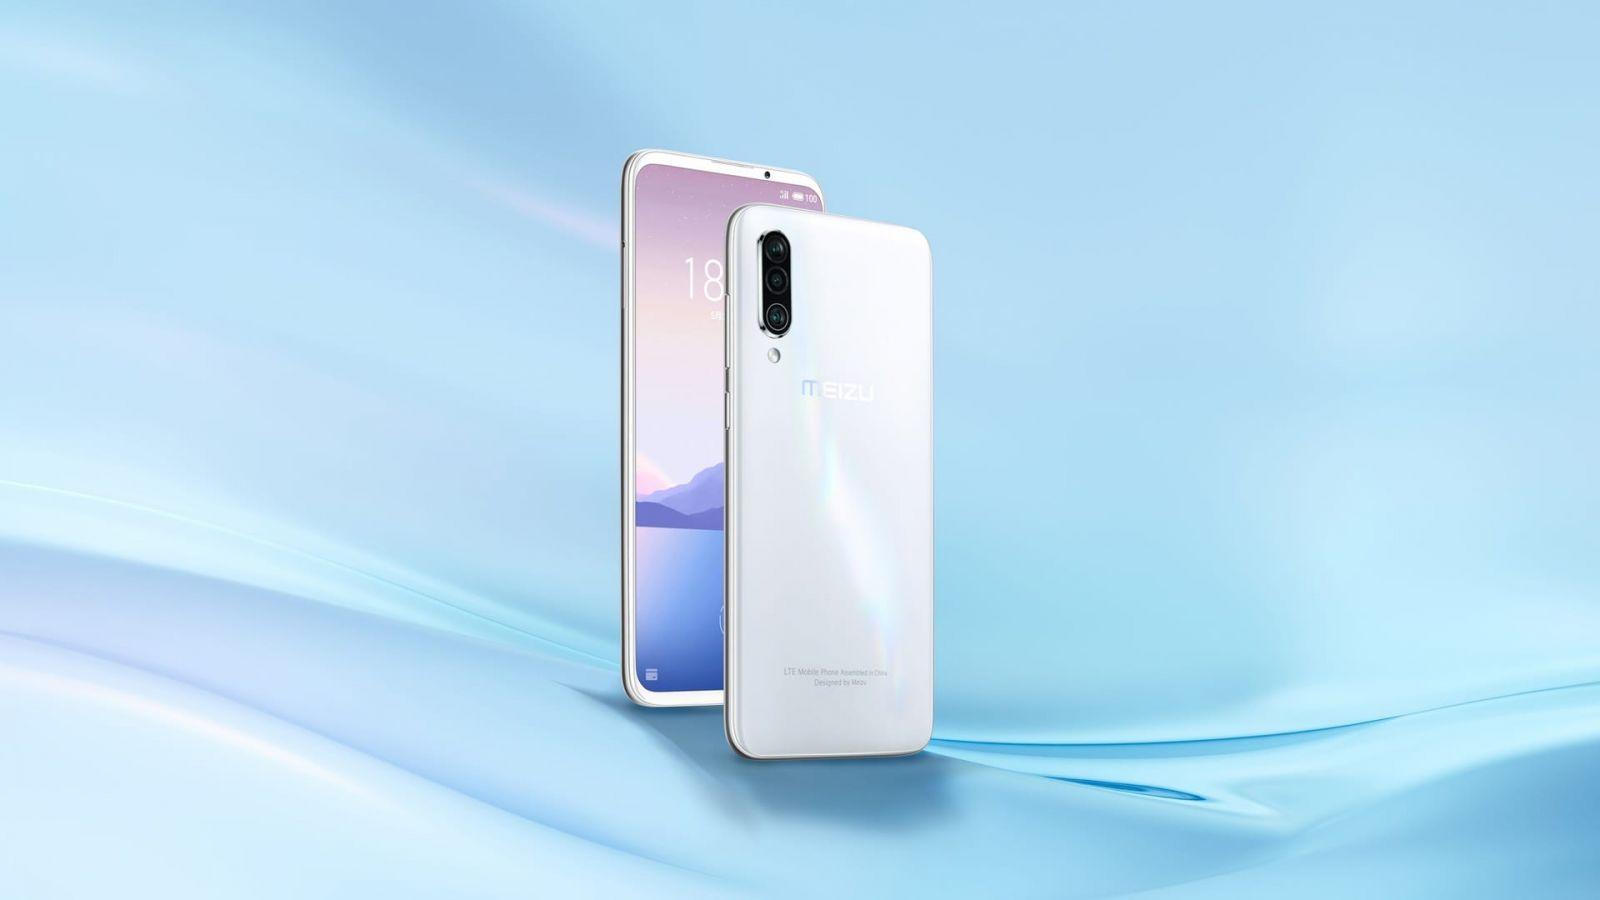 Meizu представила в России смартфон Meizu 16Xs (meizu 16xs 1)